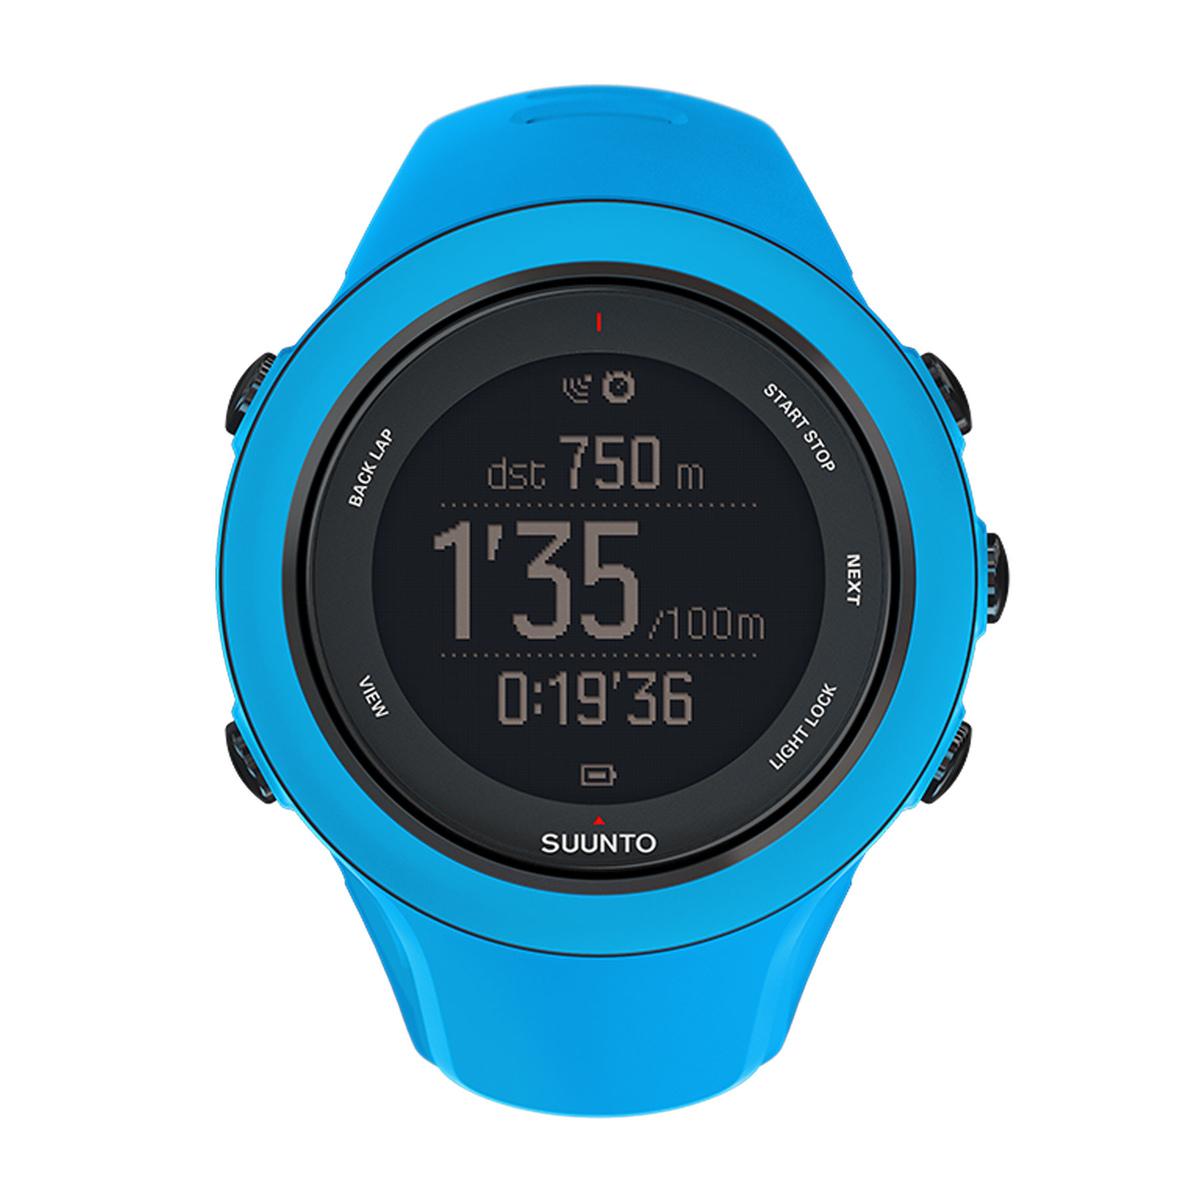 Image of Ambit3 sports blue